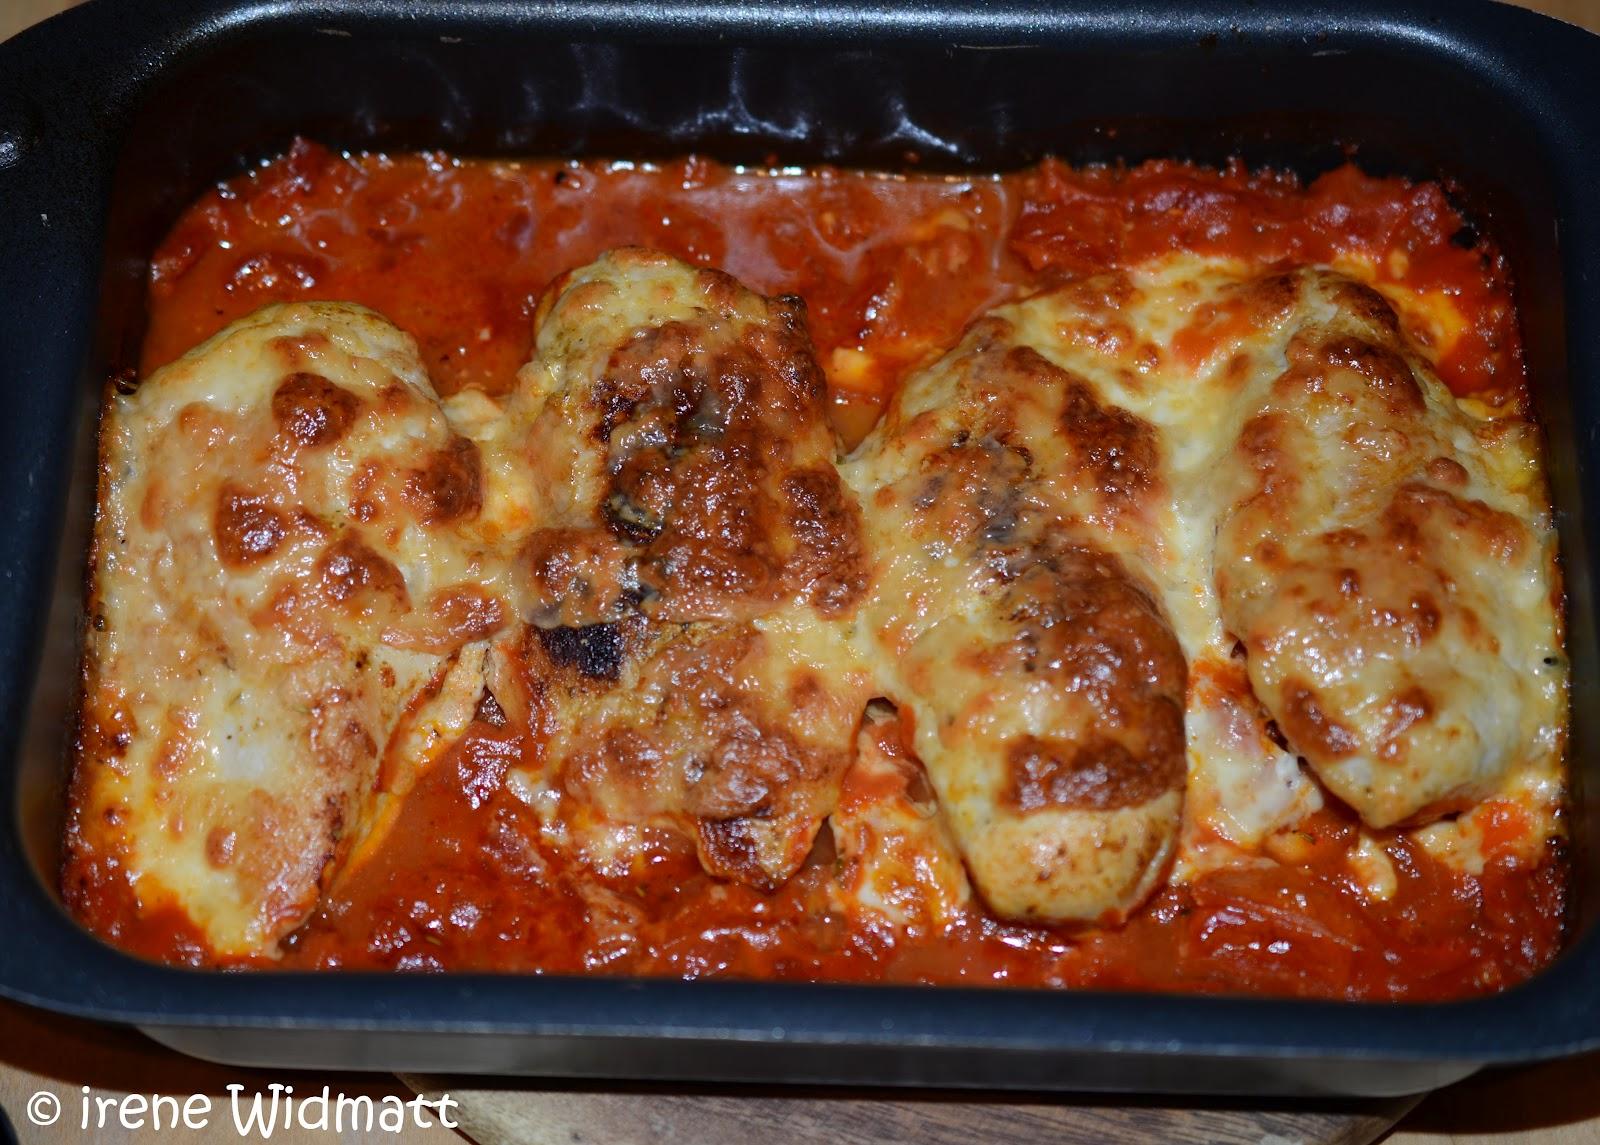 Poulet brust überbacken an tomatensauce